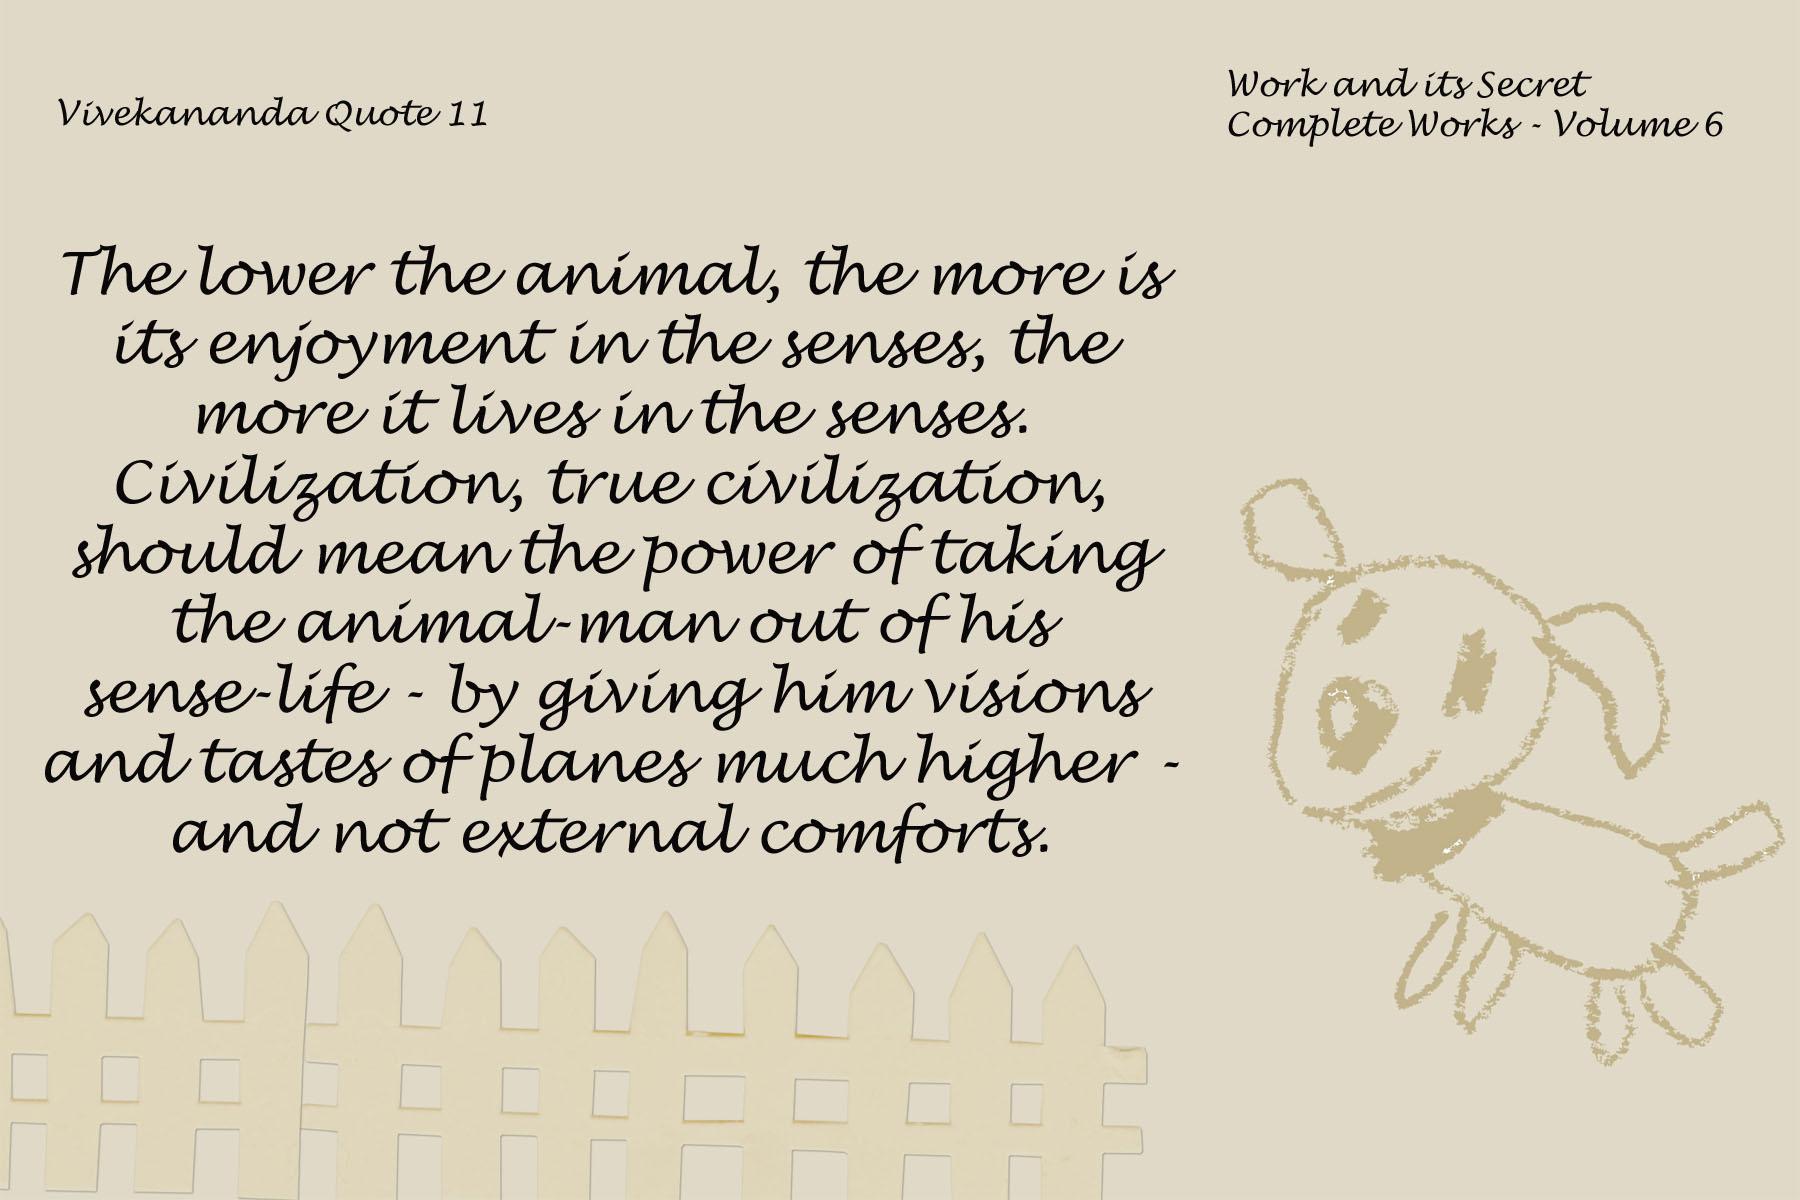 Vivekananda Quote 11